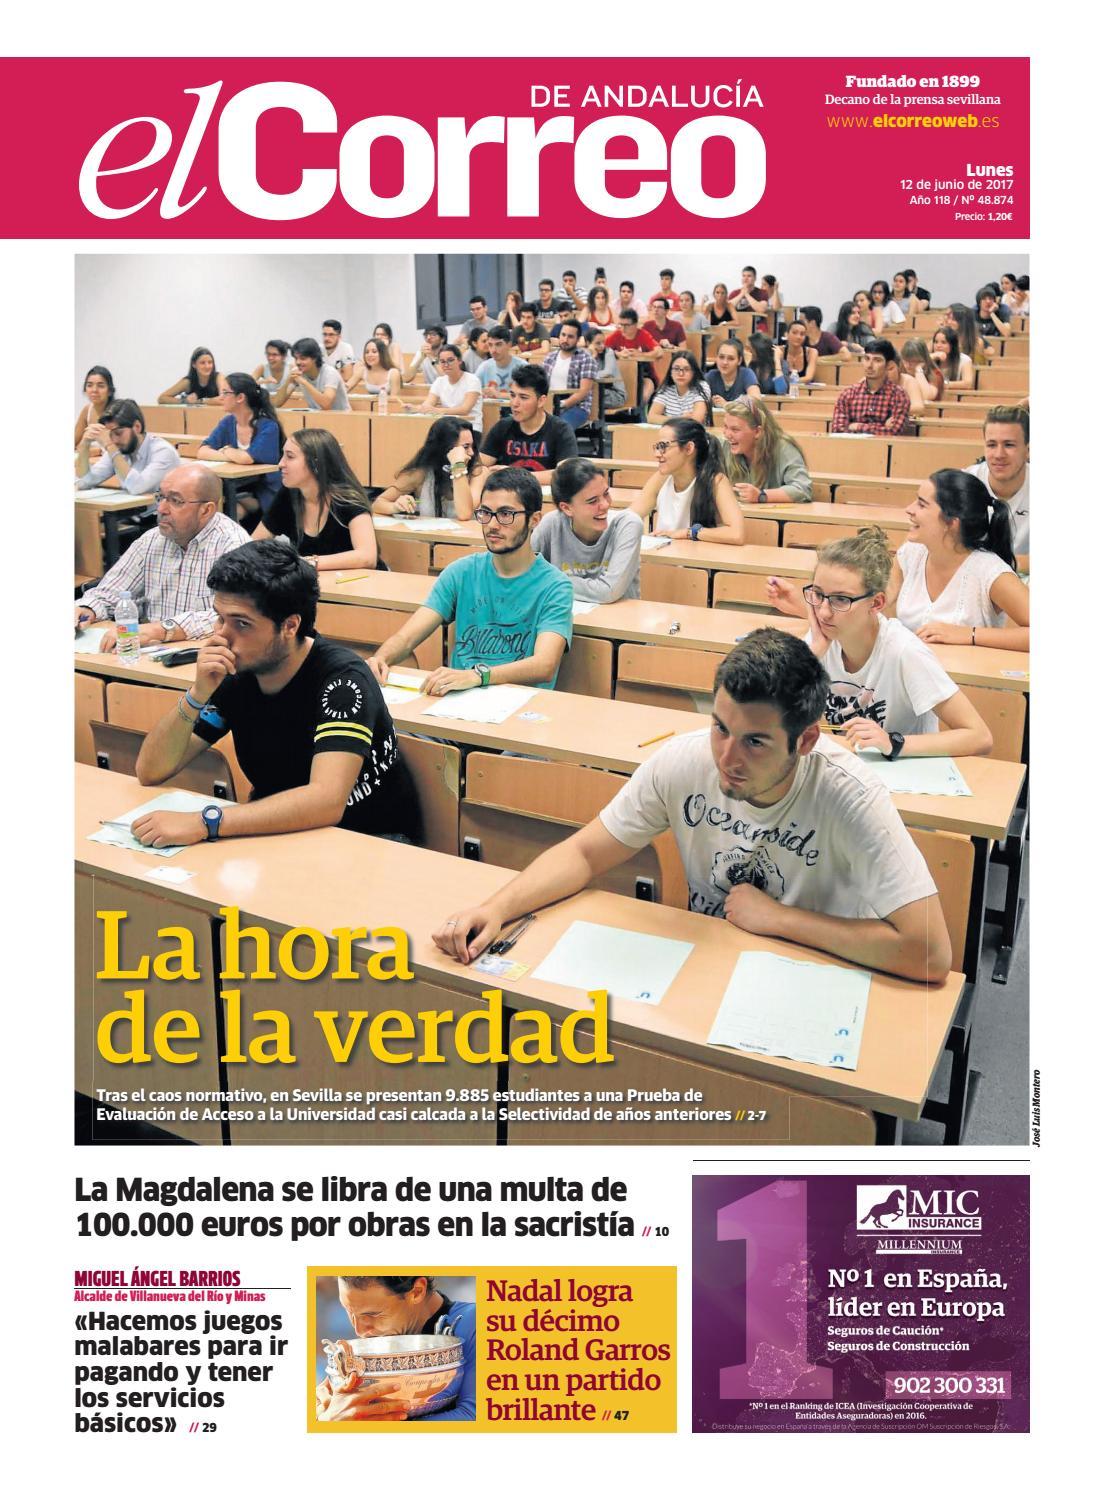 dd6d072b7 12 06 2017 El Correo de Andalucía by EL CORREO DE ANDALUCÍA S.L. - issuu